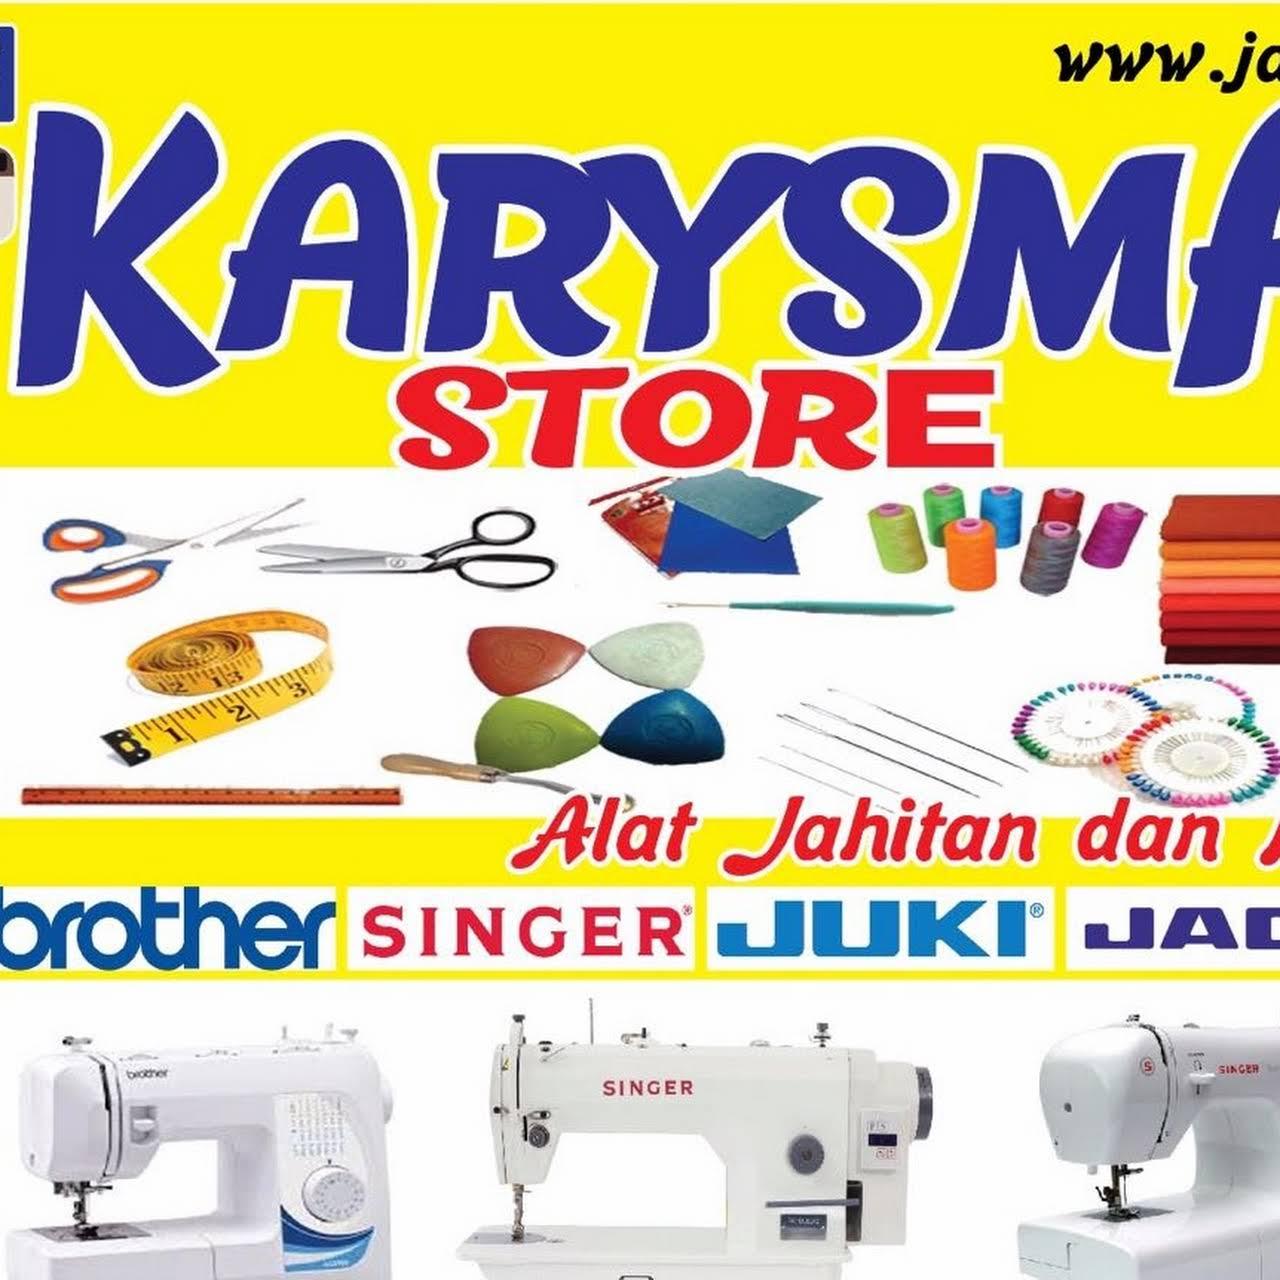 Karysma Store Alat Jahitan Dan Mesin Jahit Melaka Sewing Machine Store In Taman Seri Paya Rumput